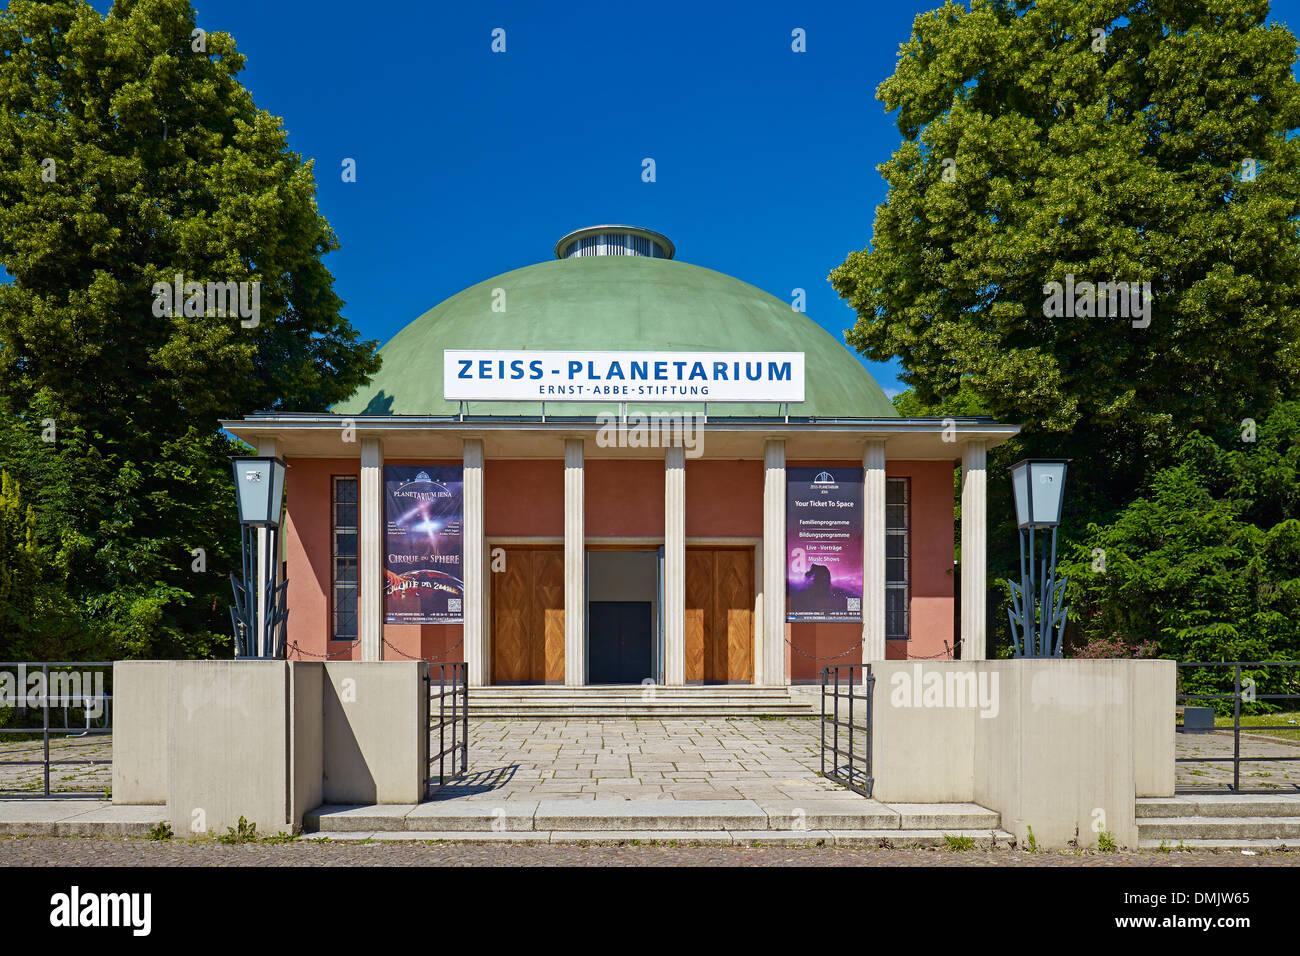 Zeiss Planetarium in Jena, Thuringia, Germany - Stock Image